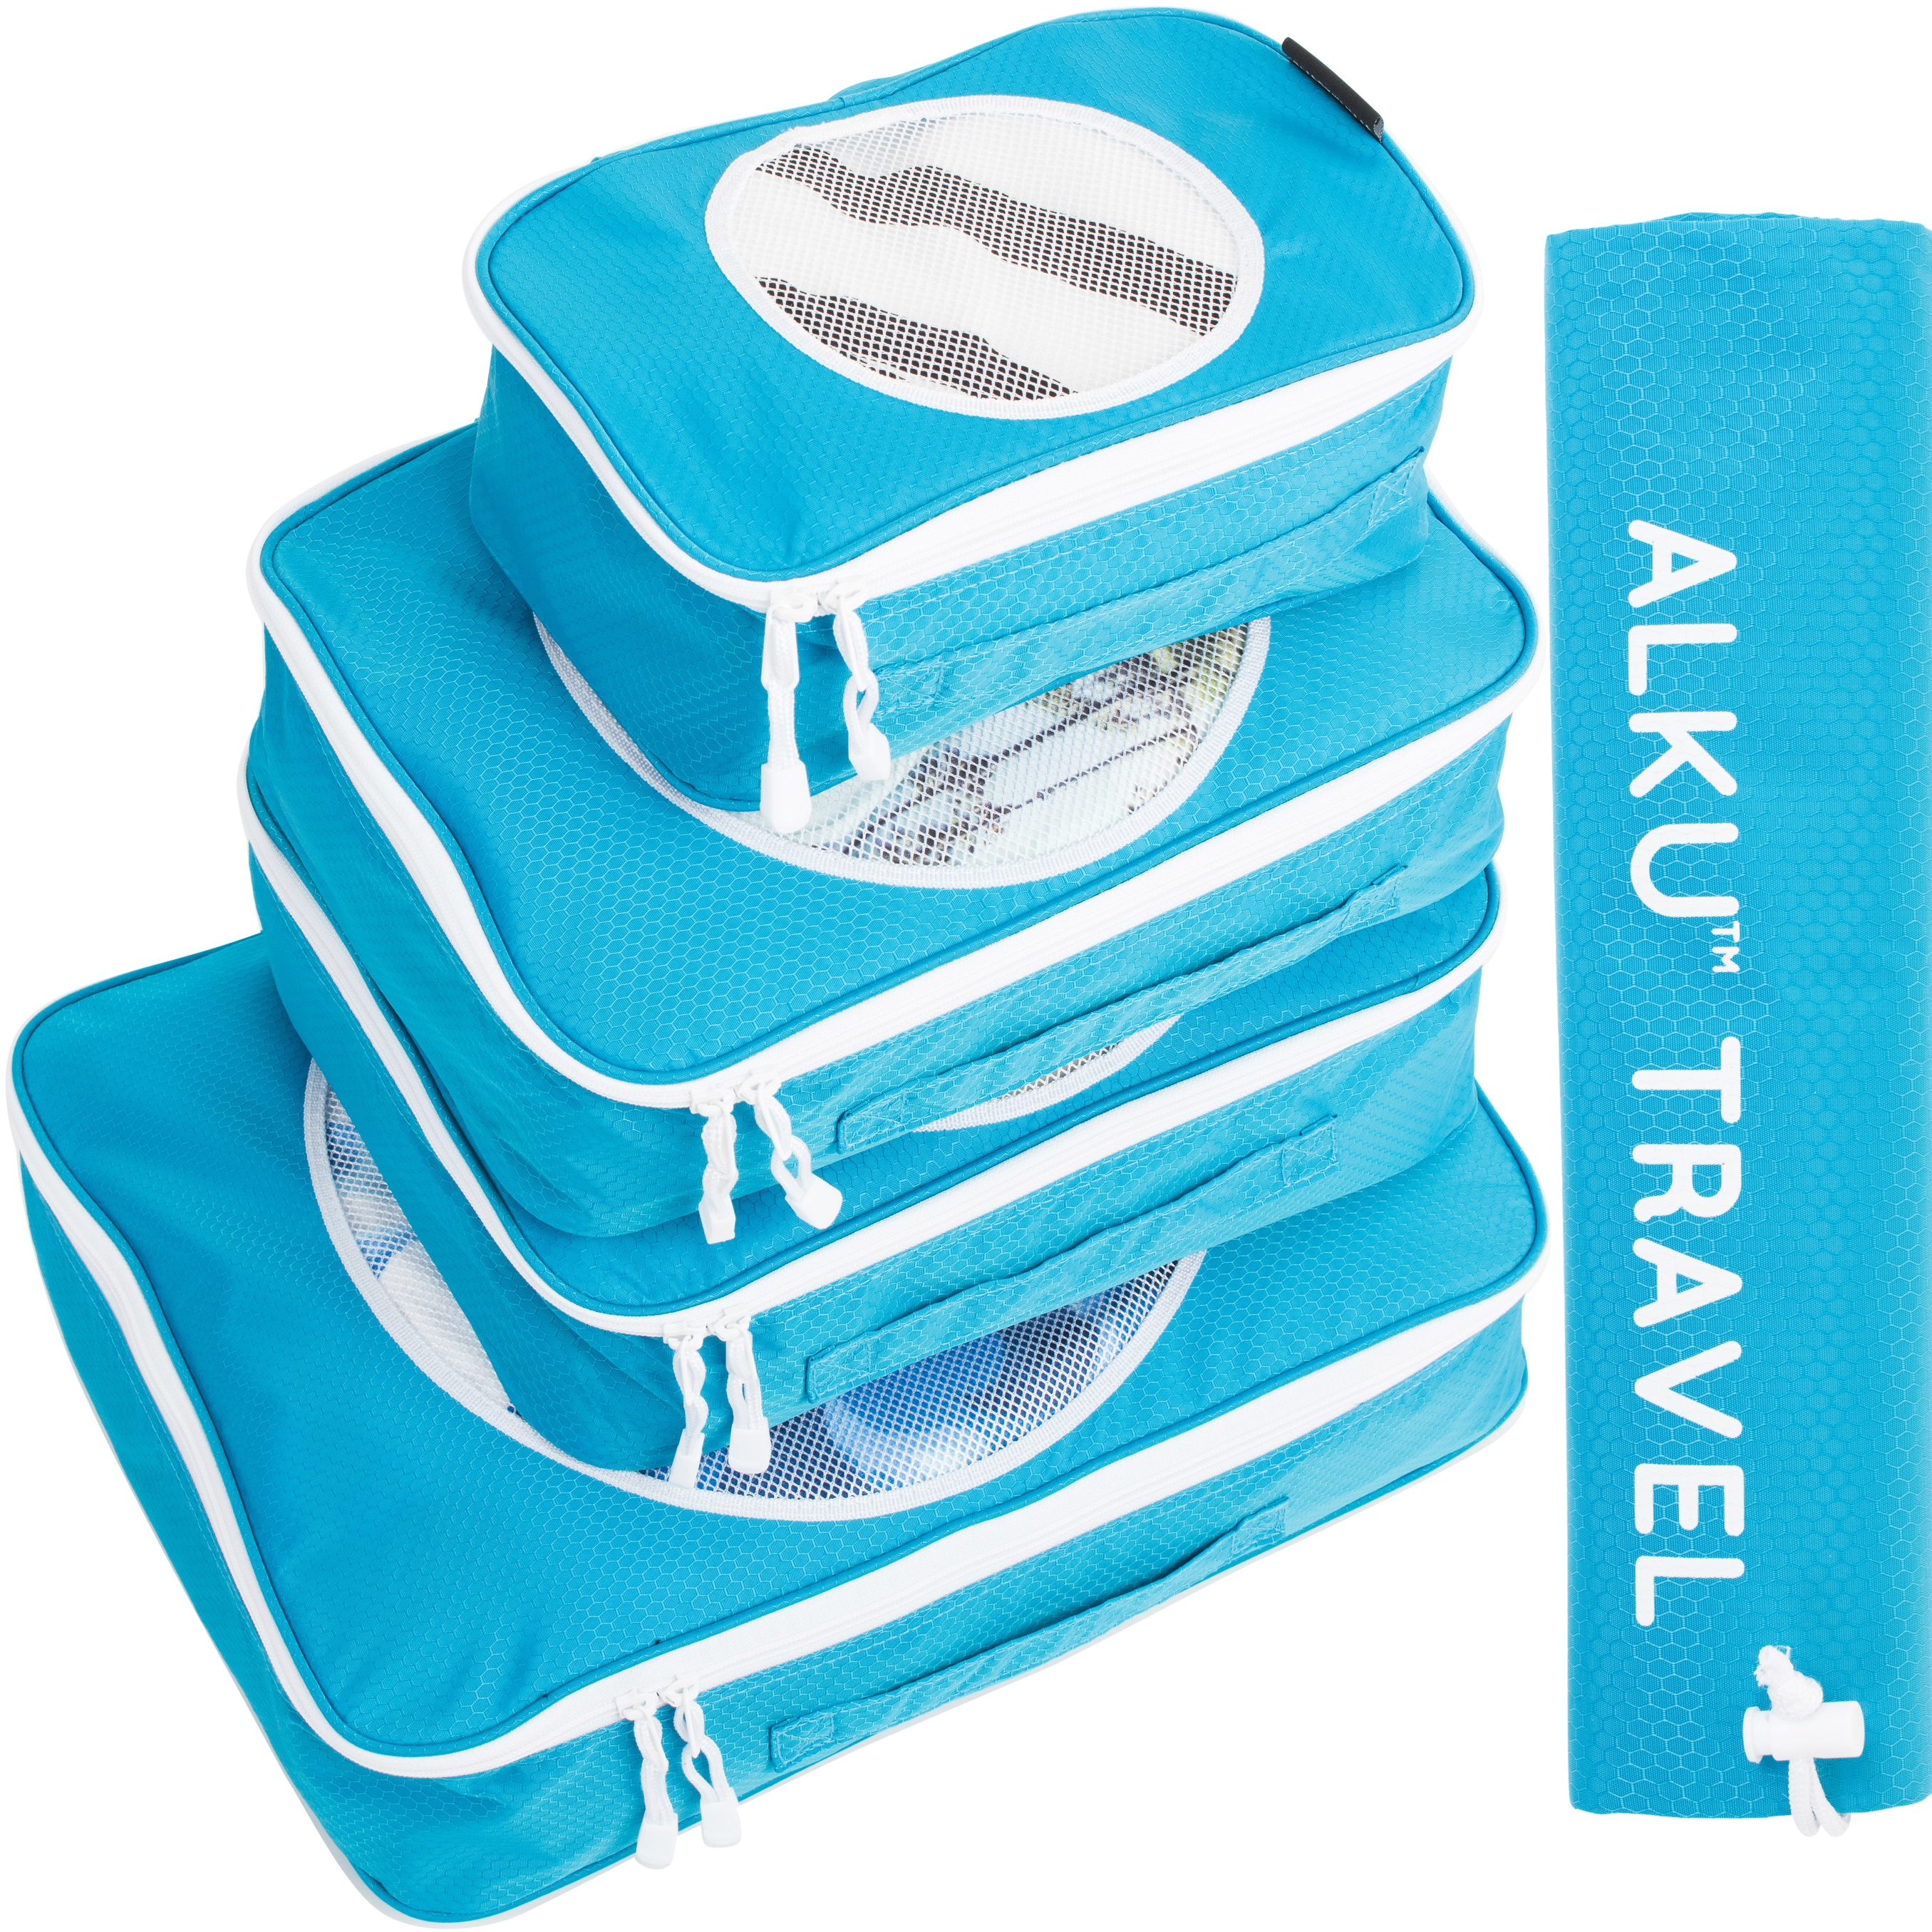 AlkuTravel-Packing-Cubes-Bahama-Blue